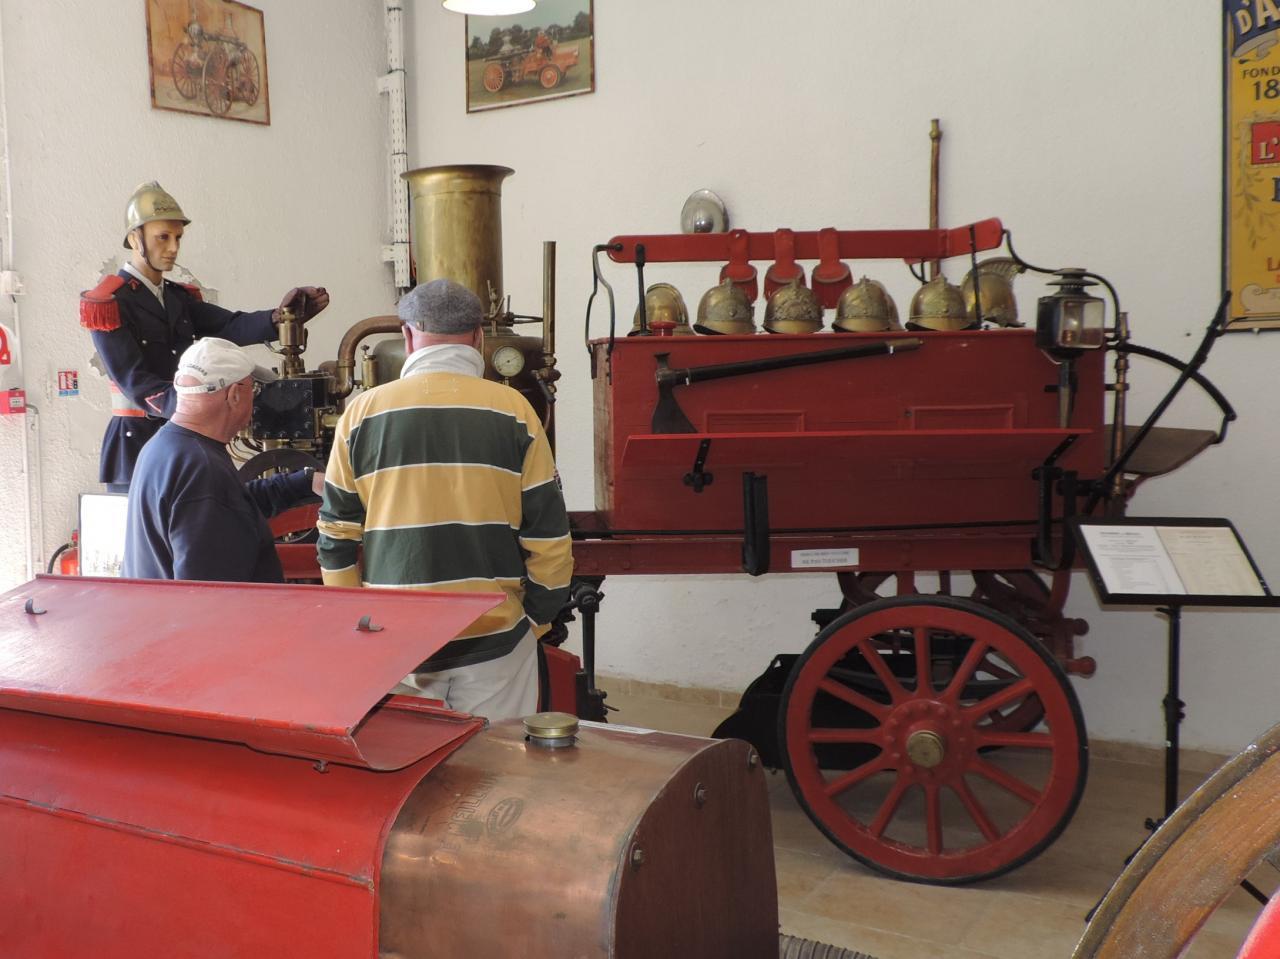 24 avril, Fontaine d'Eure & musée 1900